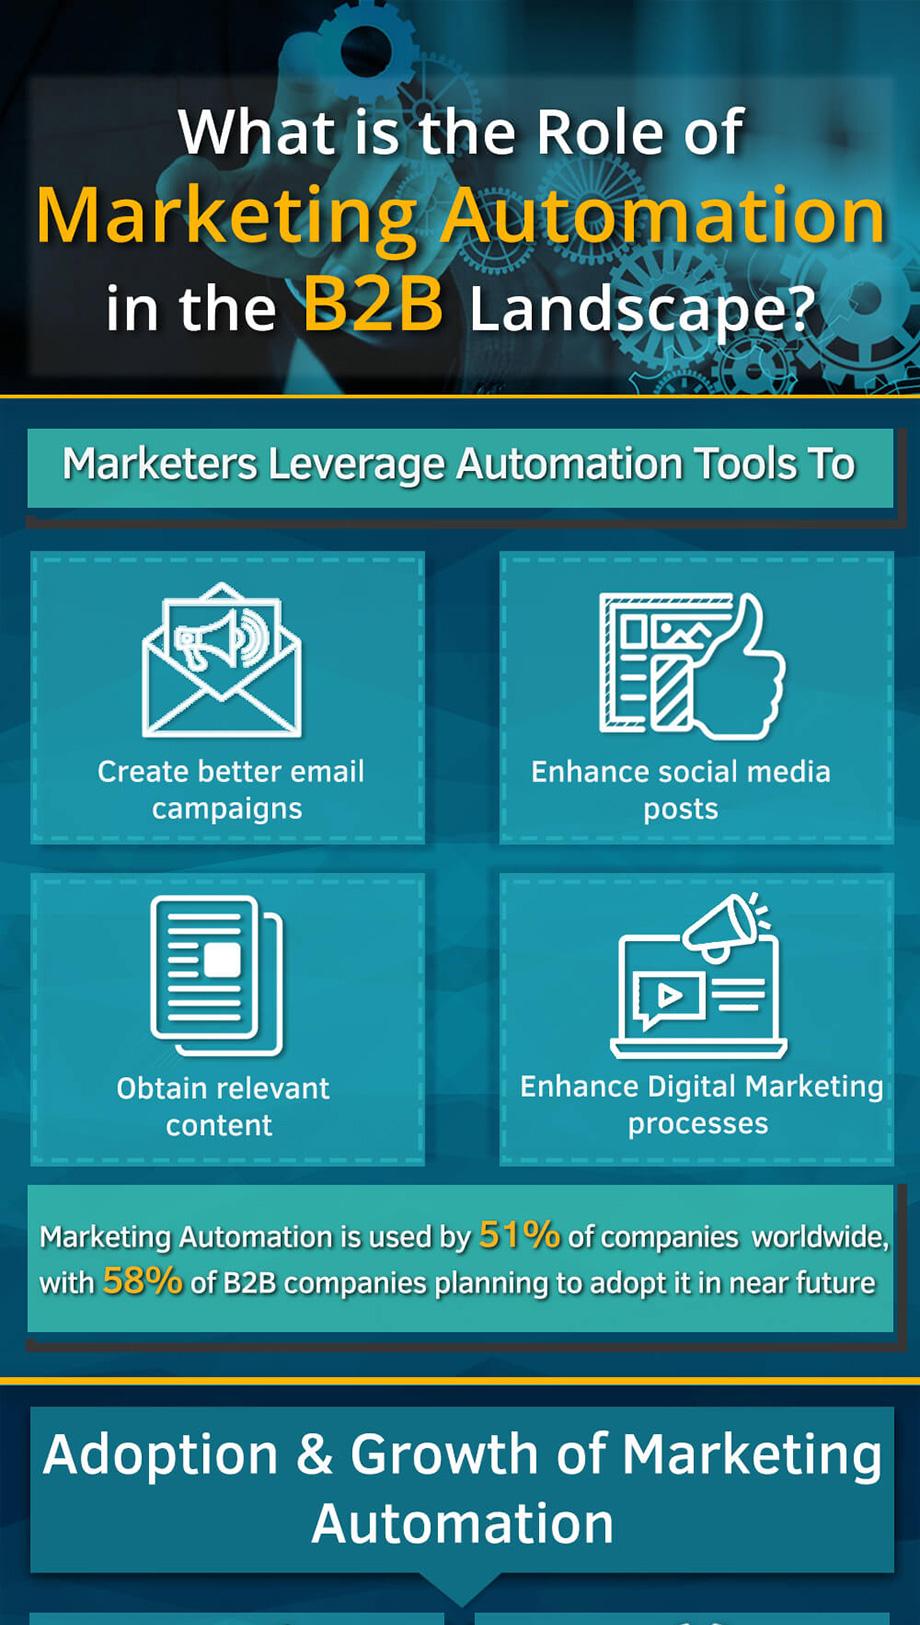 b2b-marketing-automation-role-infographic-1